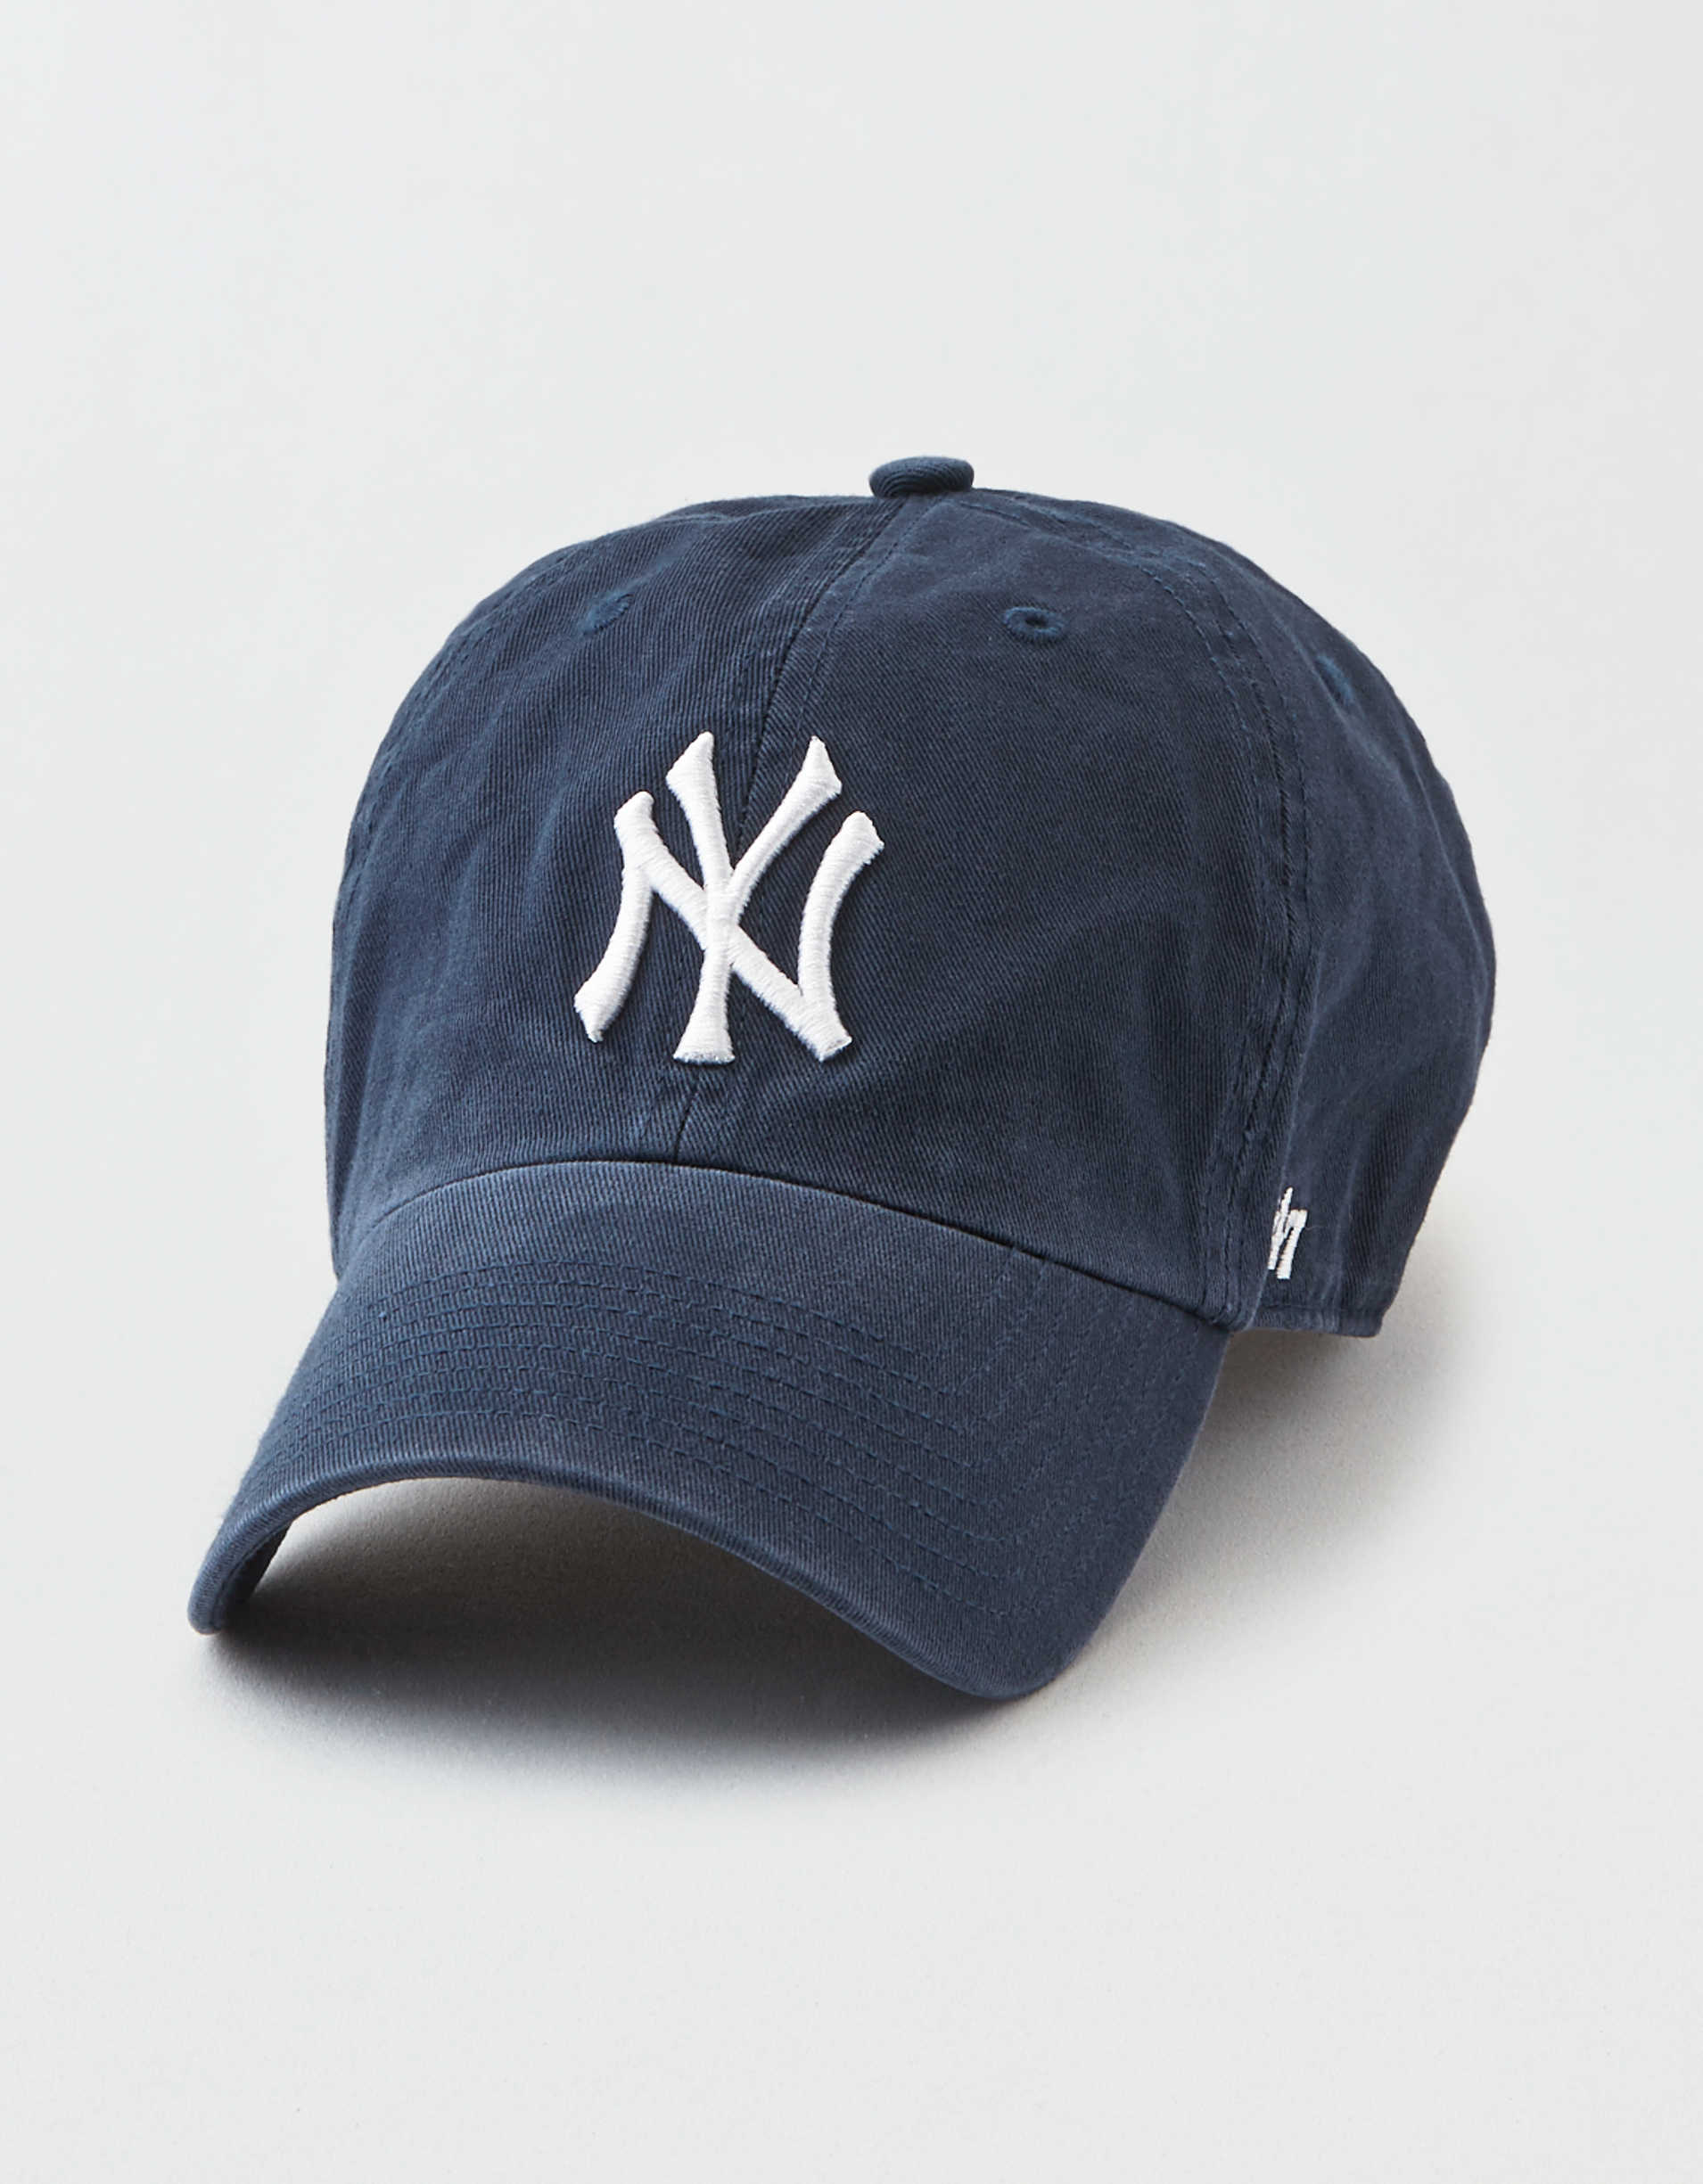 47 Brand New York Yankees Baseball Cap